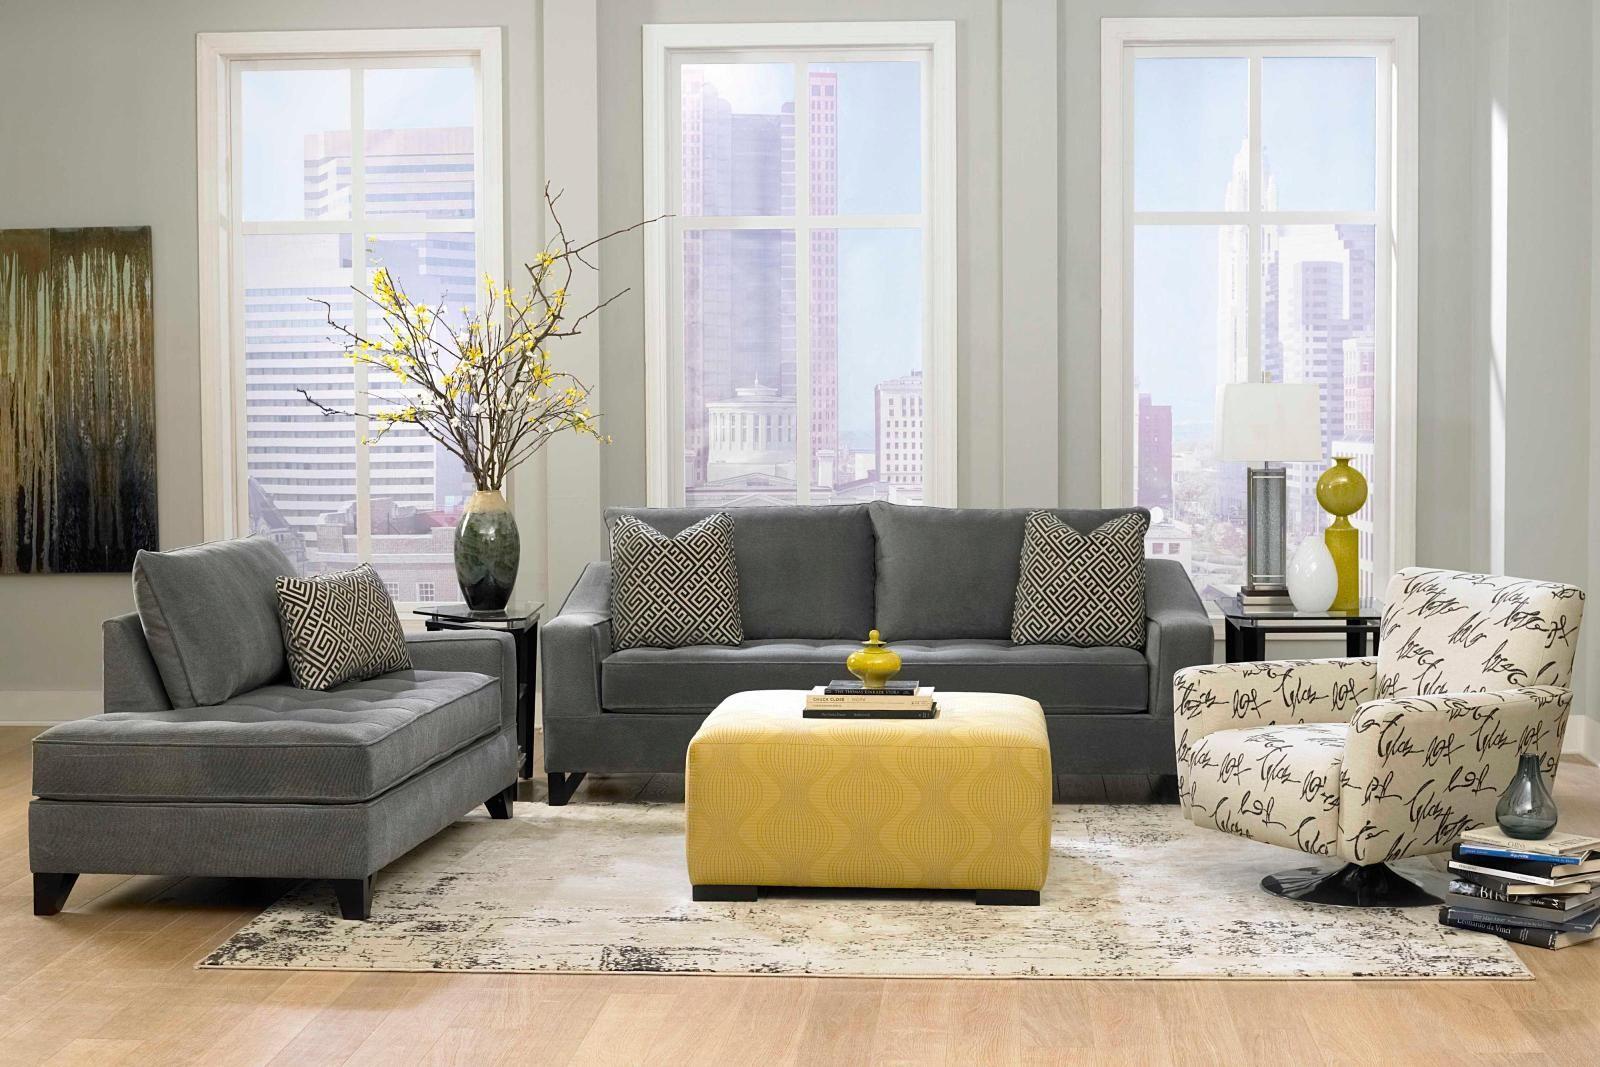 Living Room Ideas With Grey Sofa grey sofa living room ideas | sitting room | pinterest | grey